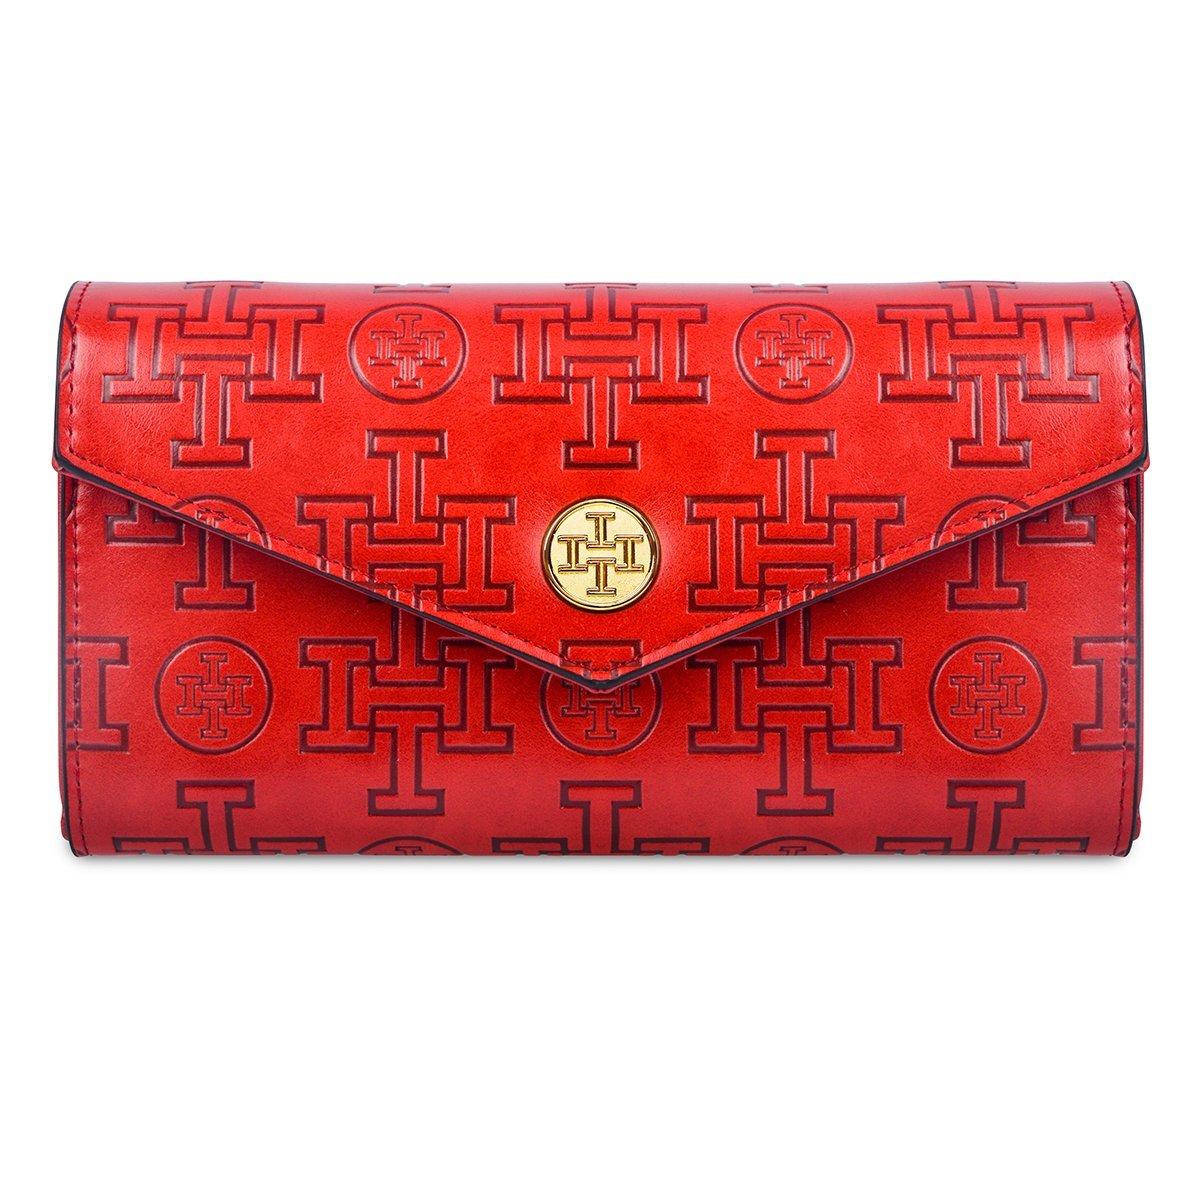 Leather Wallet for Women, i5 Stylish clutch purse designer fashionable card holder zipper bag (red)